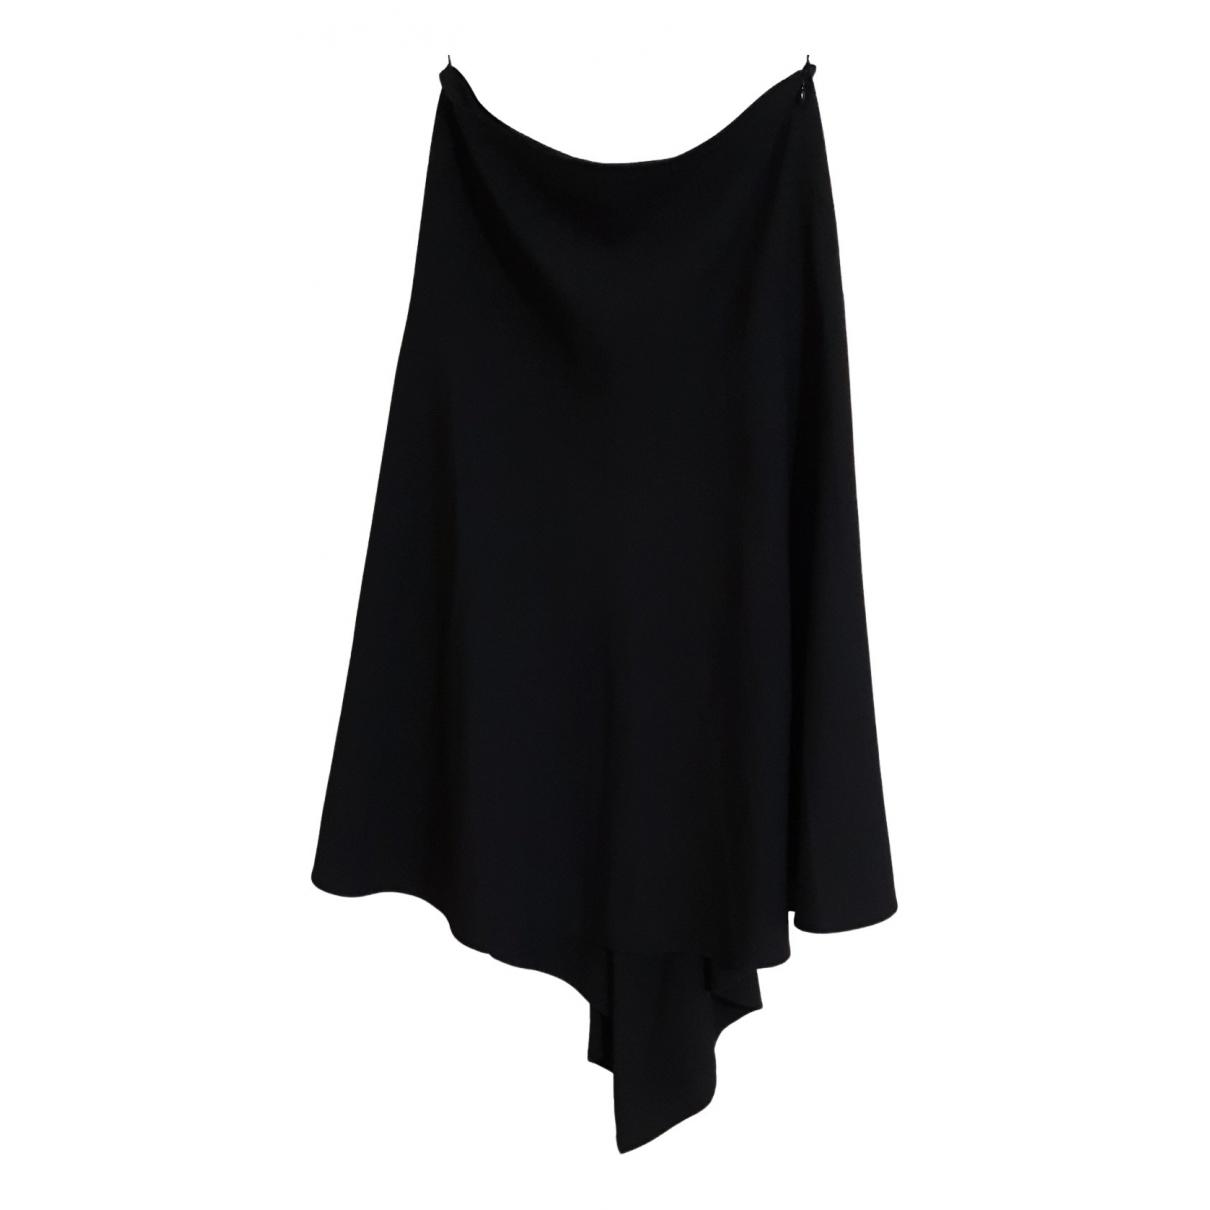 Armani Jeans N Black skirt for Women 44 IT